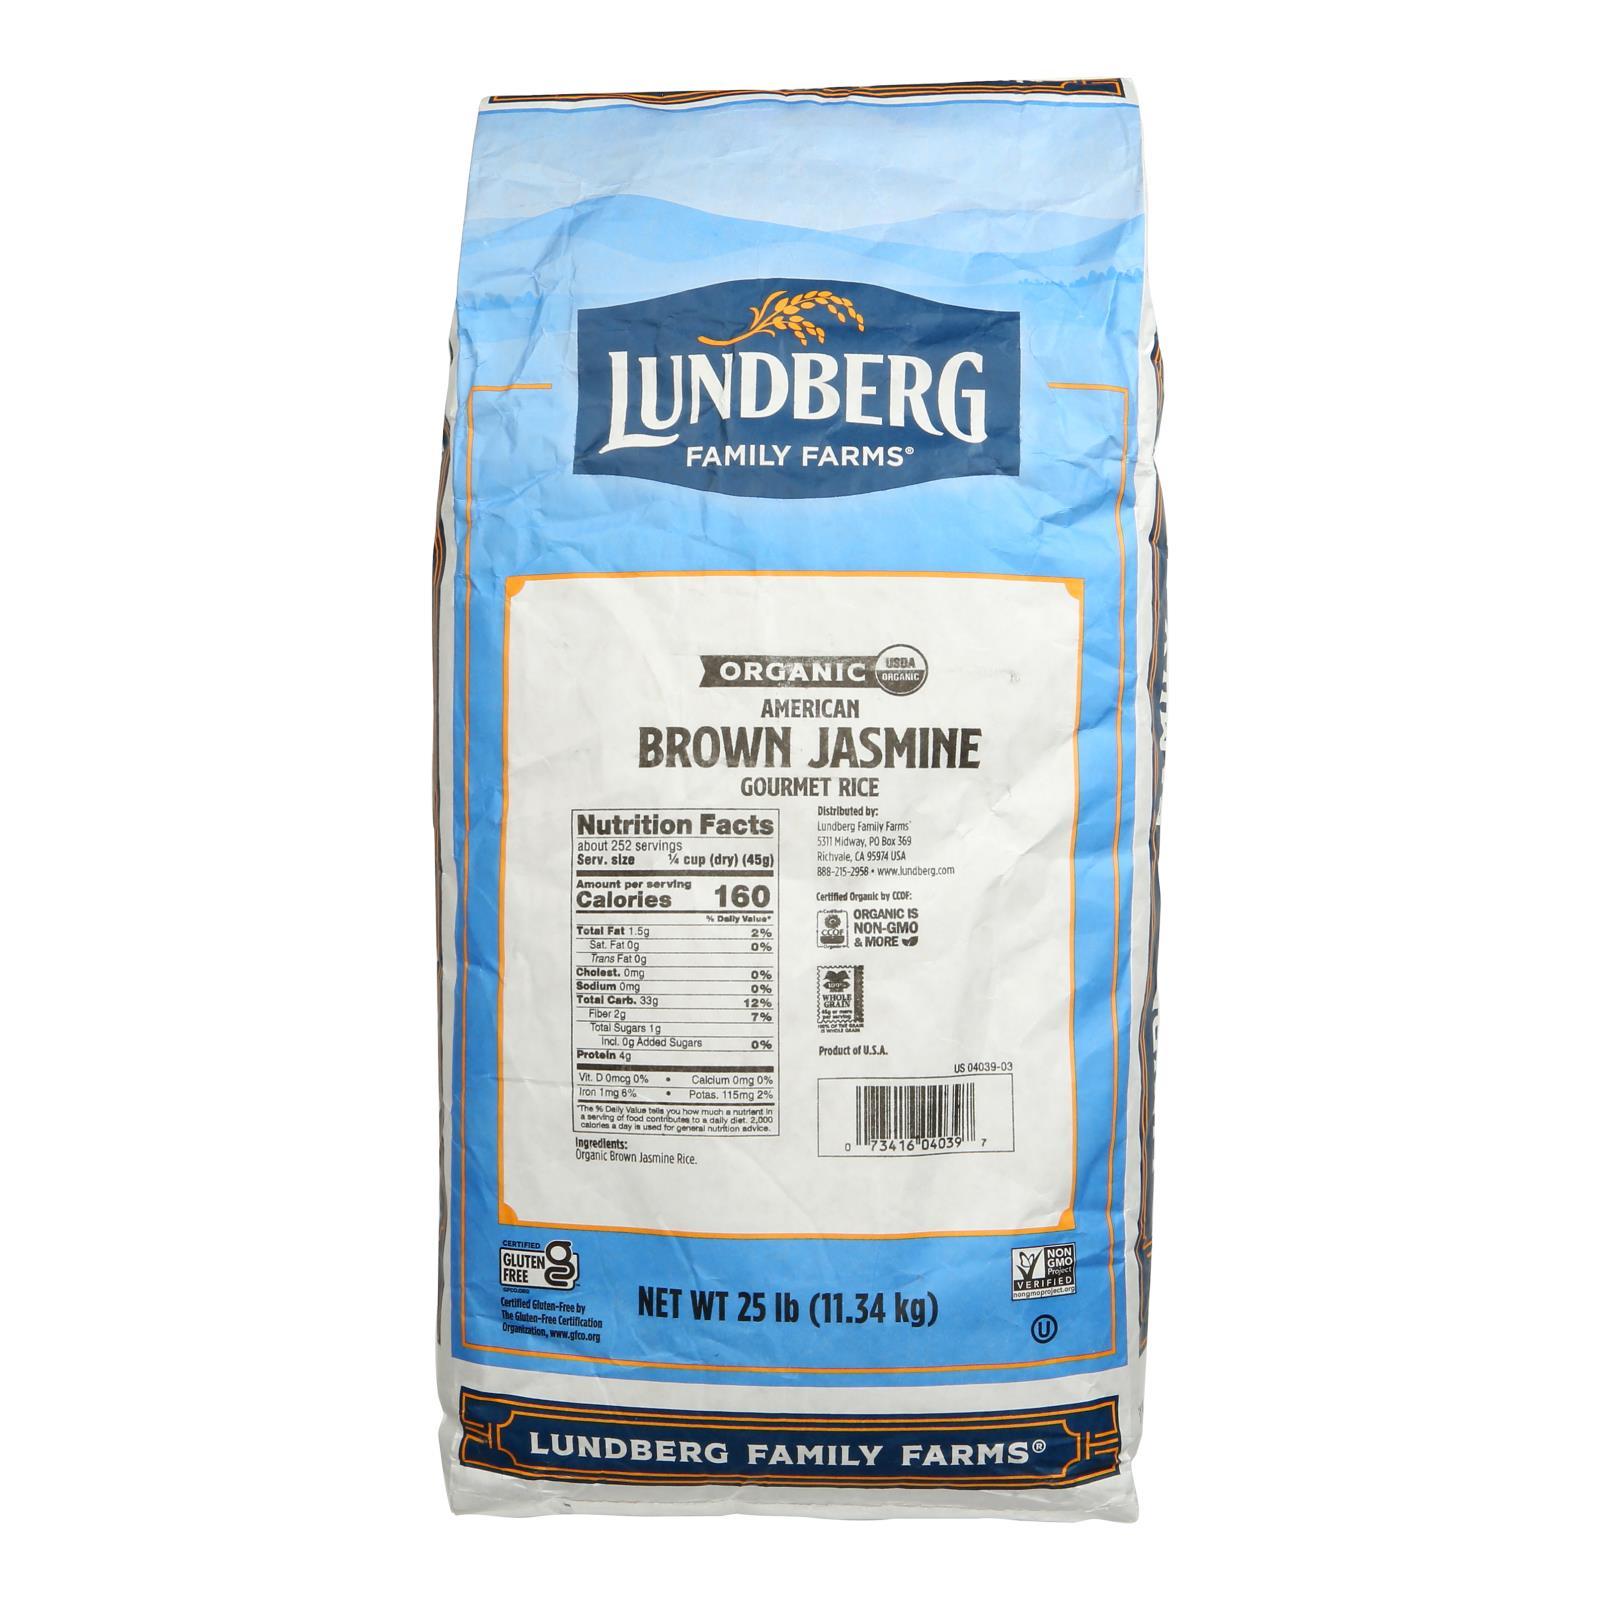 Lundberg Family Farms Organic California Brown Jasmine Rice - Case of 25 lbs